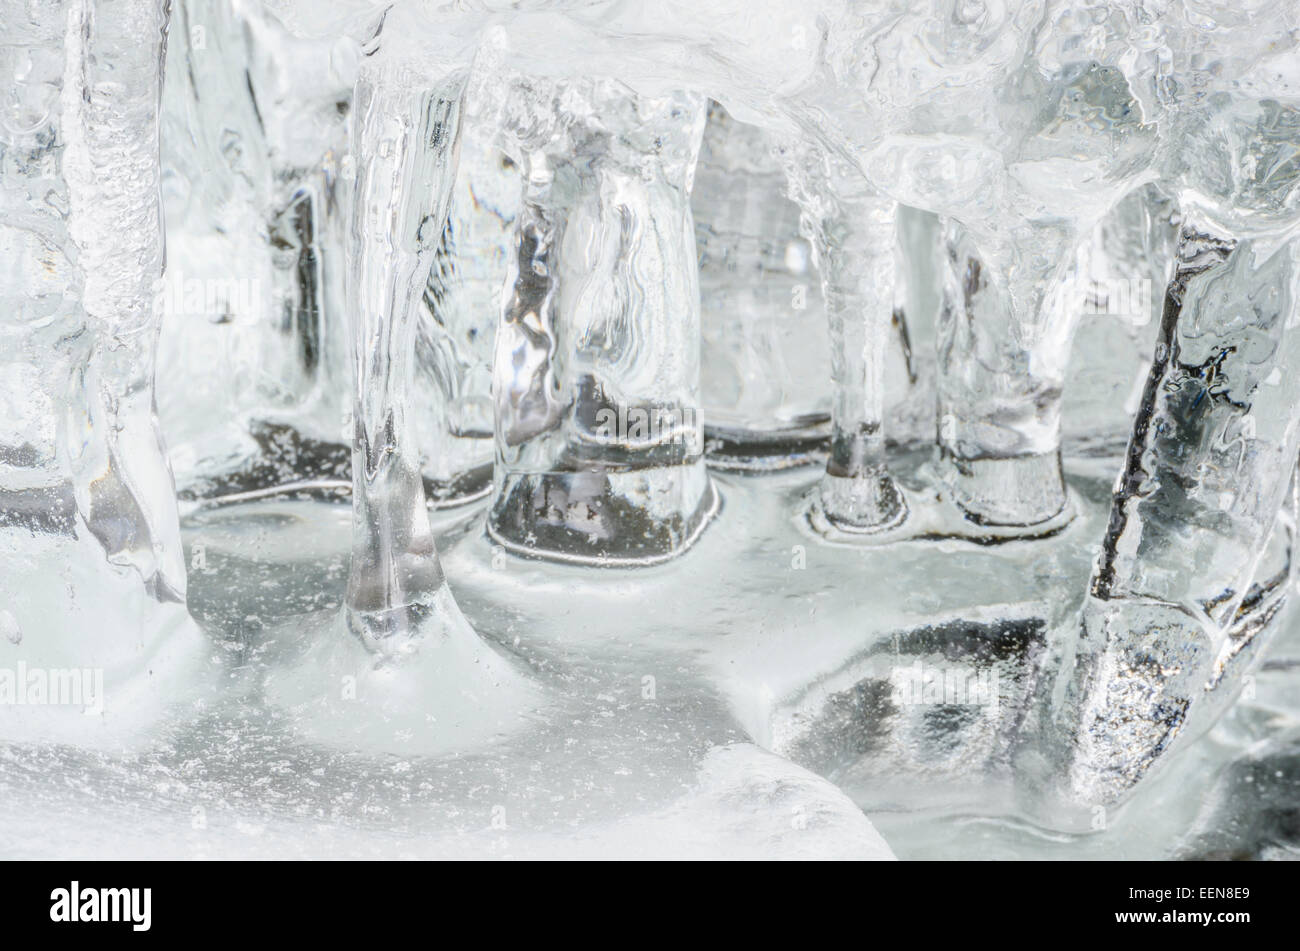 Eisstrukturen ein Einem Bach, Atndalen, Hedmark Fylke, Norwegen, Maerz 2012 Stockbild